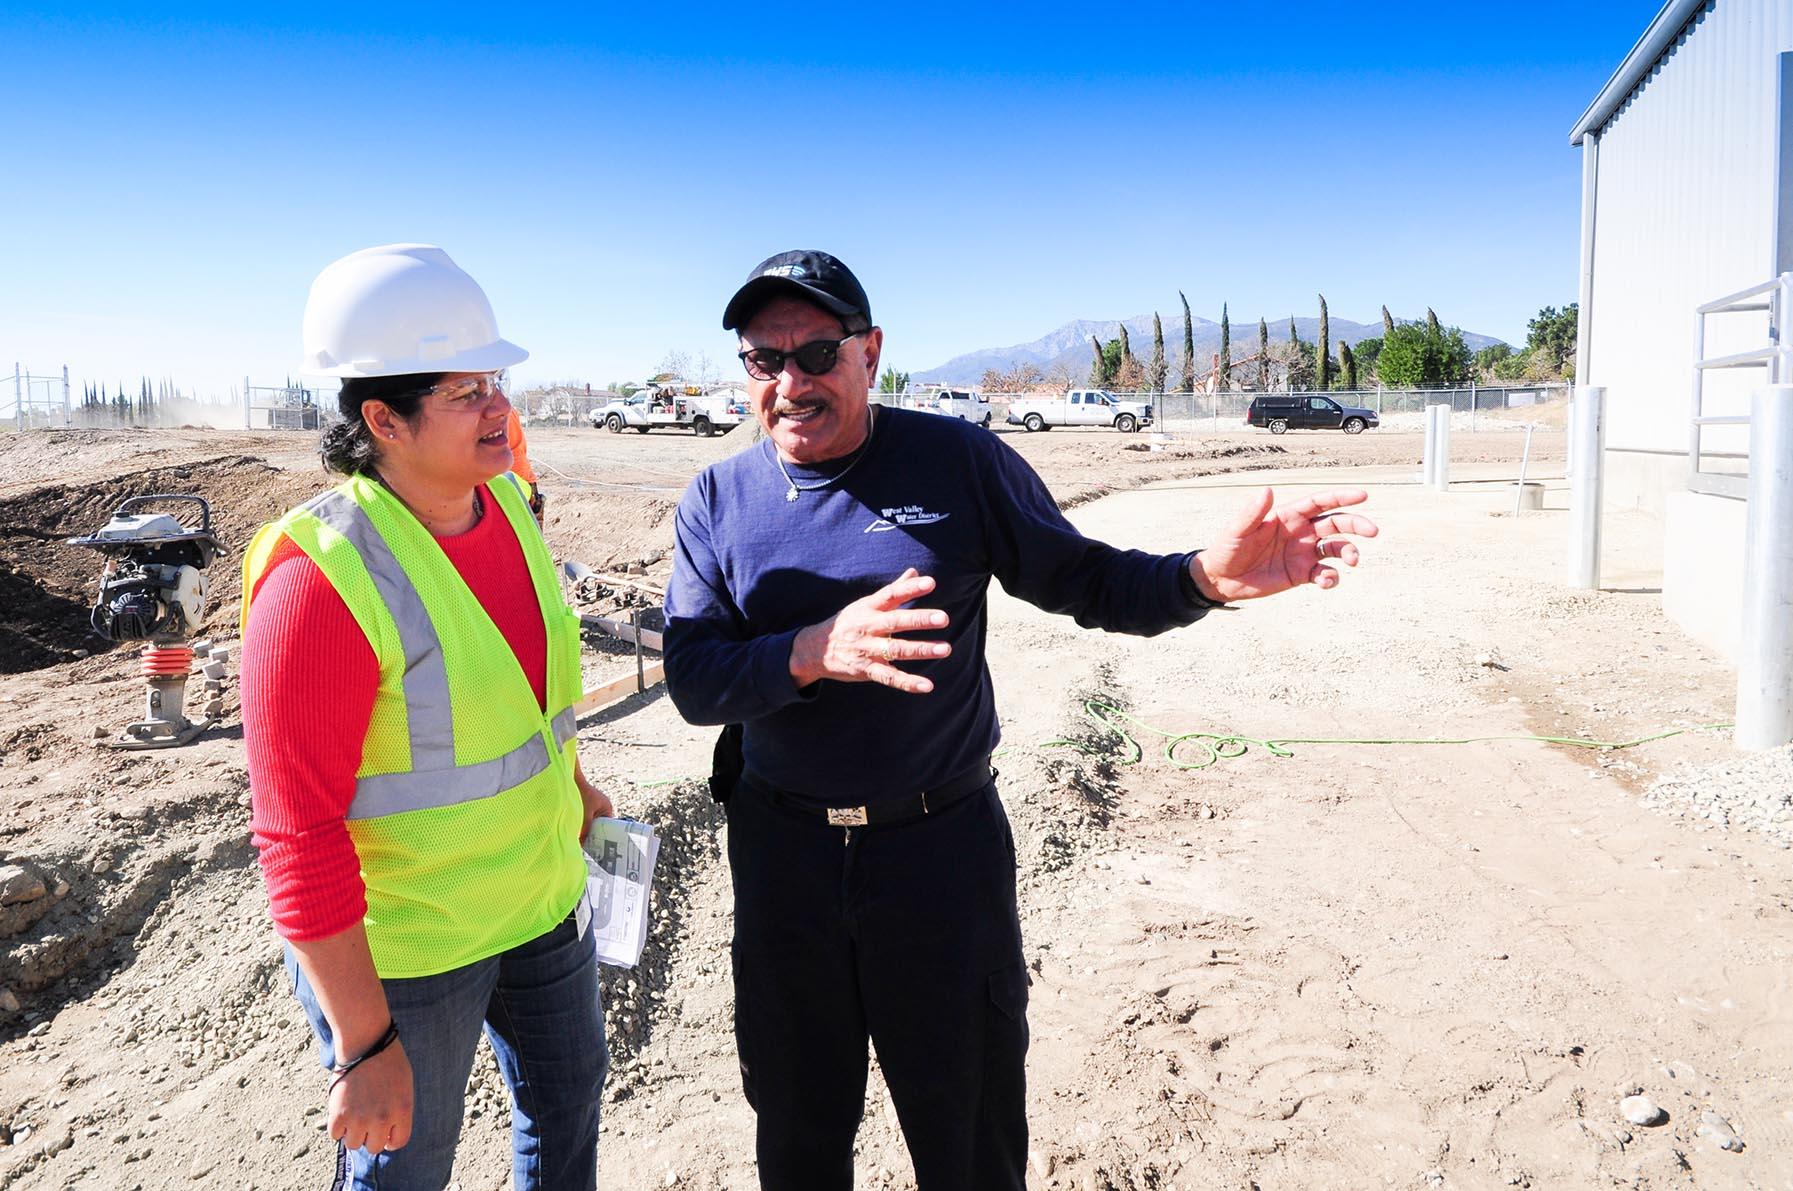 2 workers talking